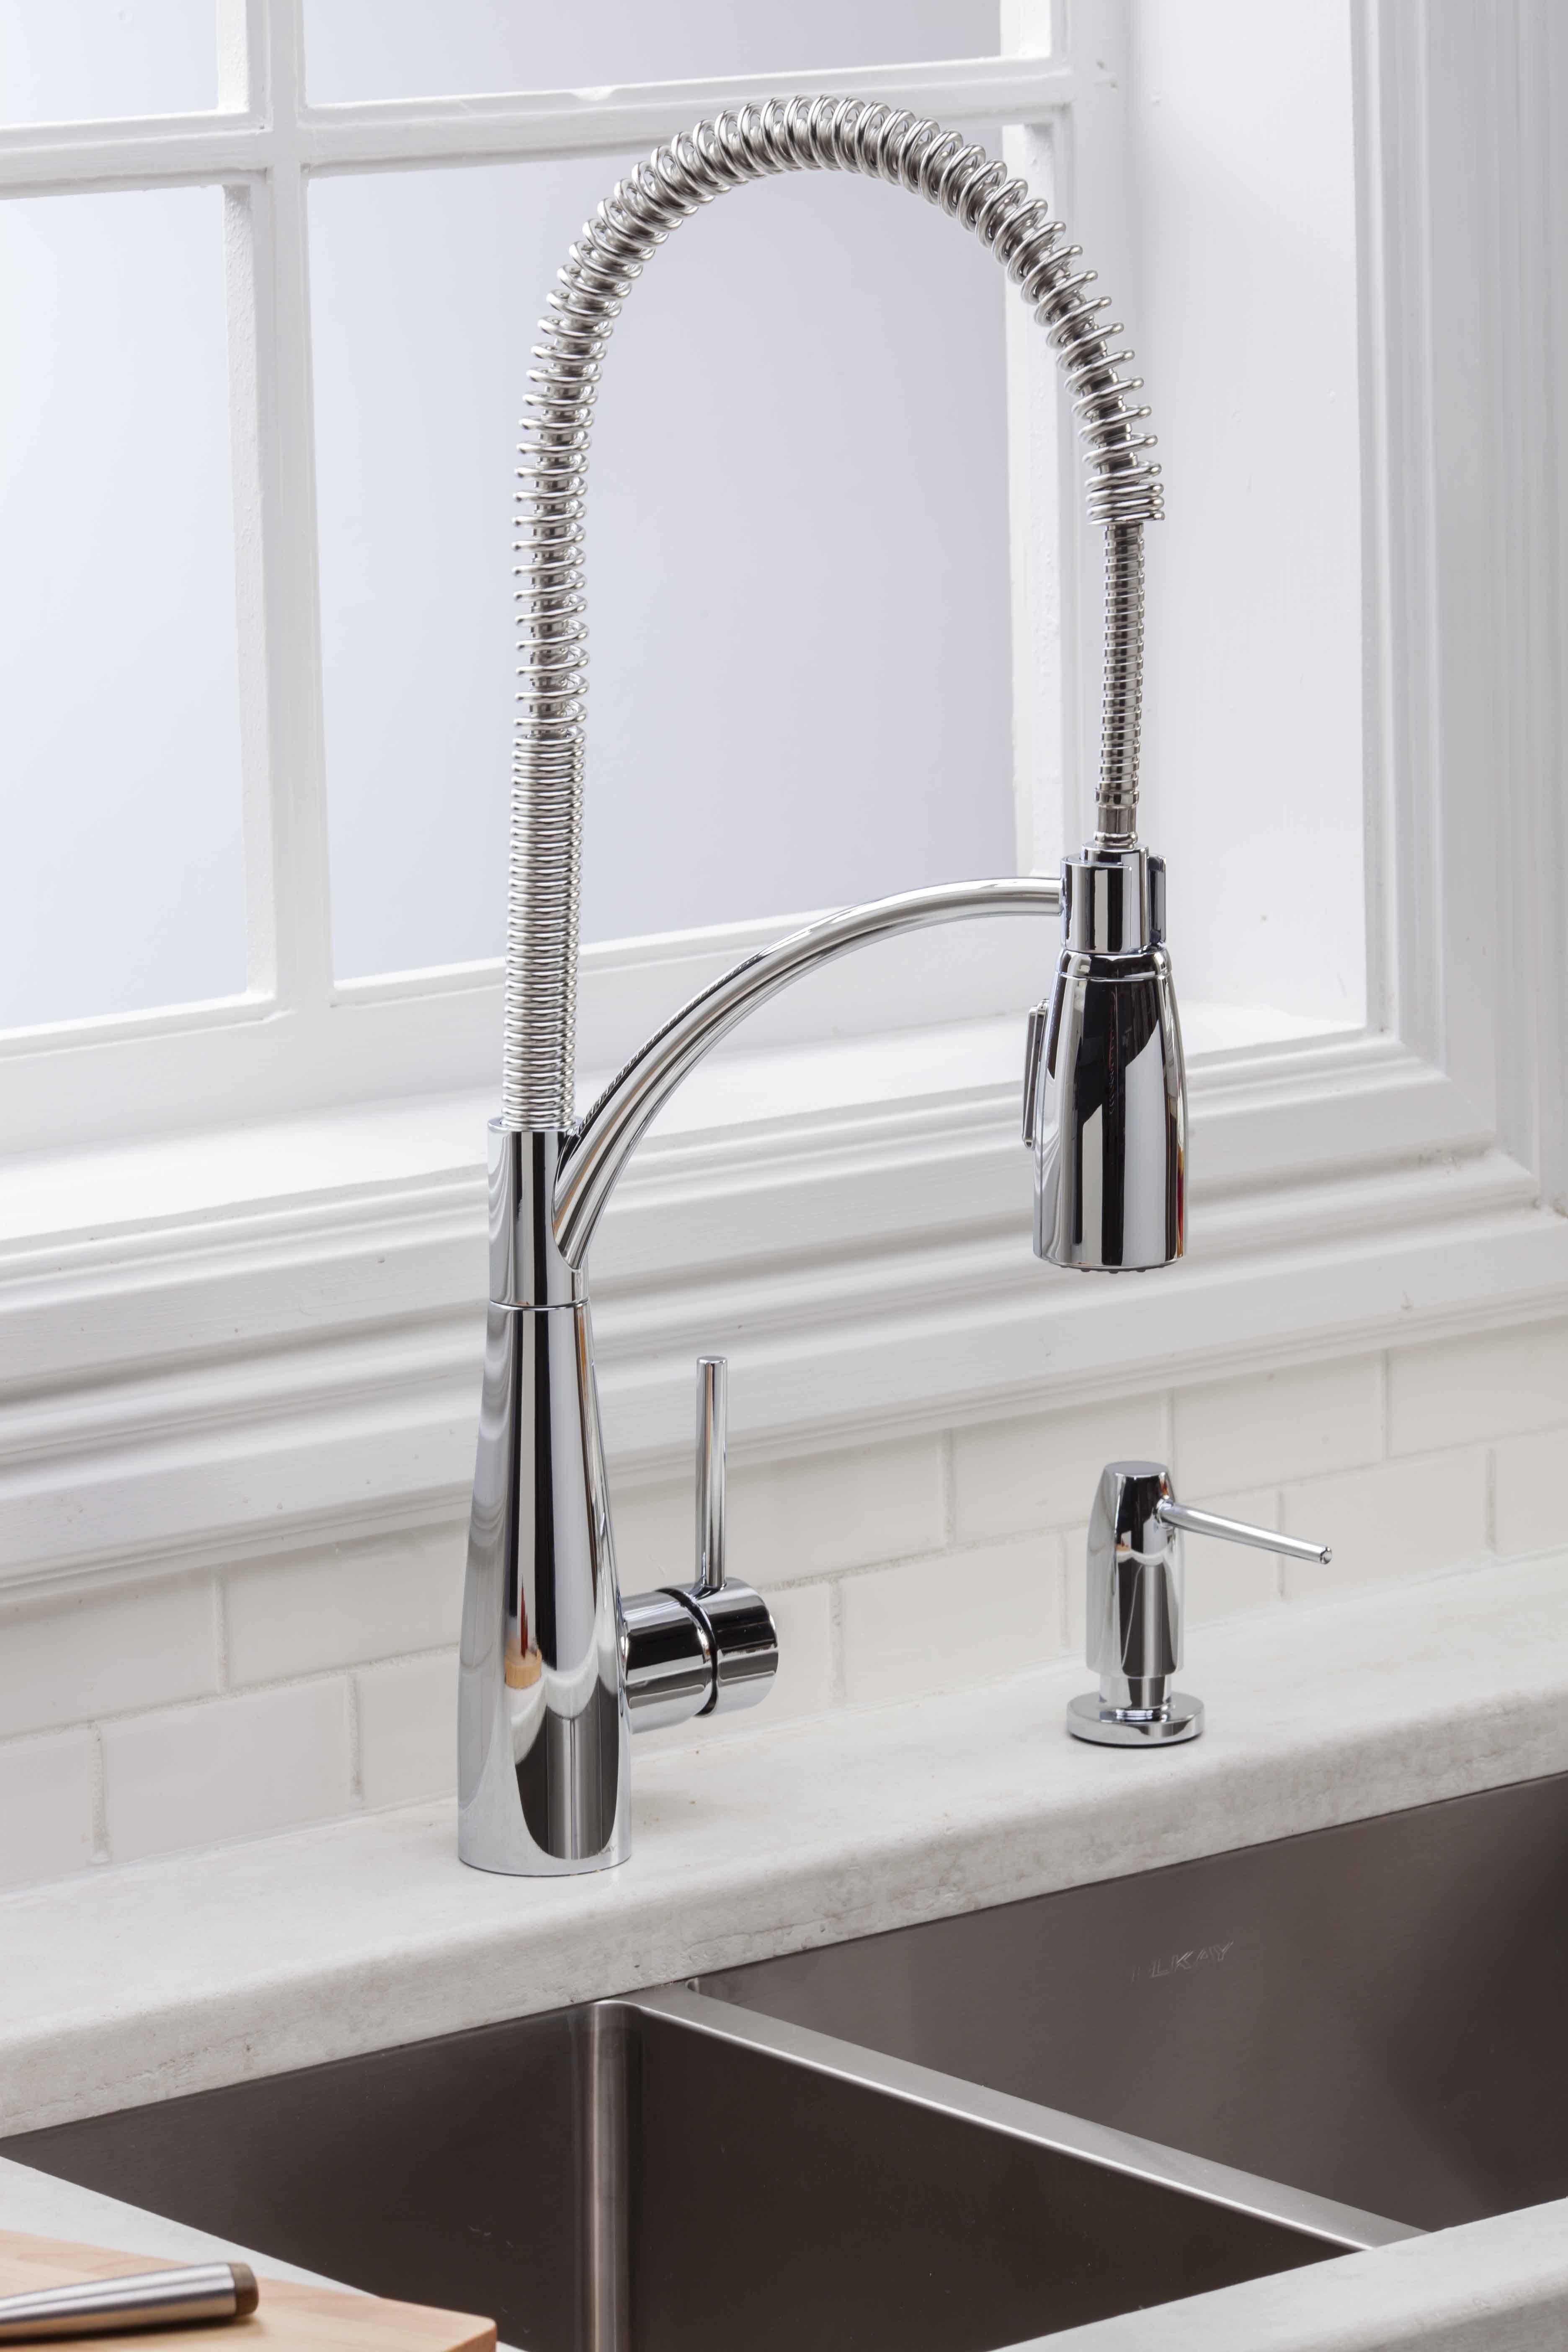 Download Wallpaper White Stuff On Kitchen Faucet